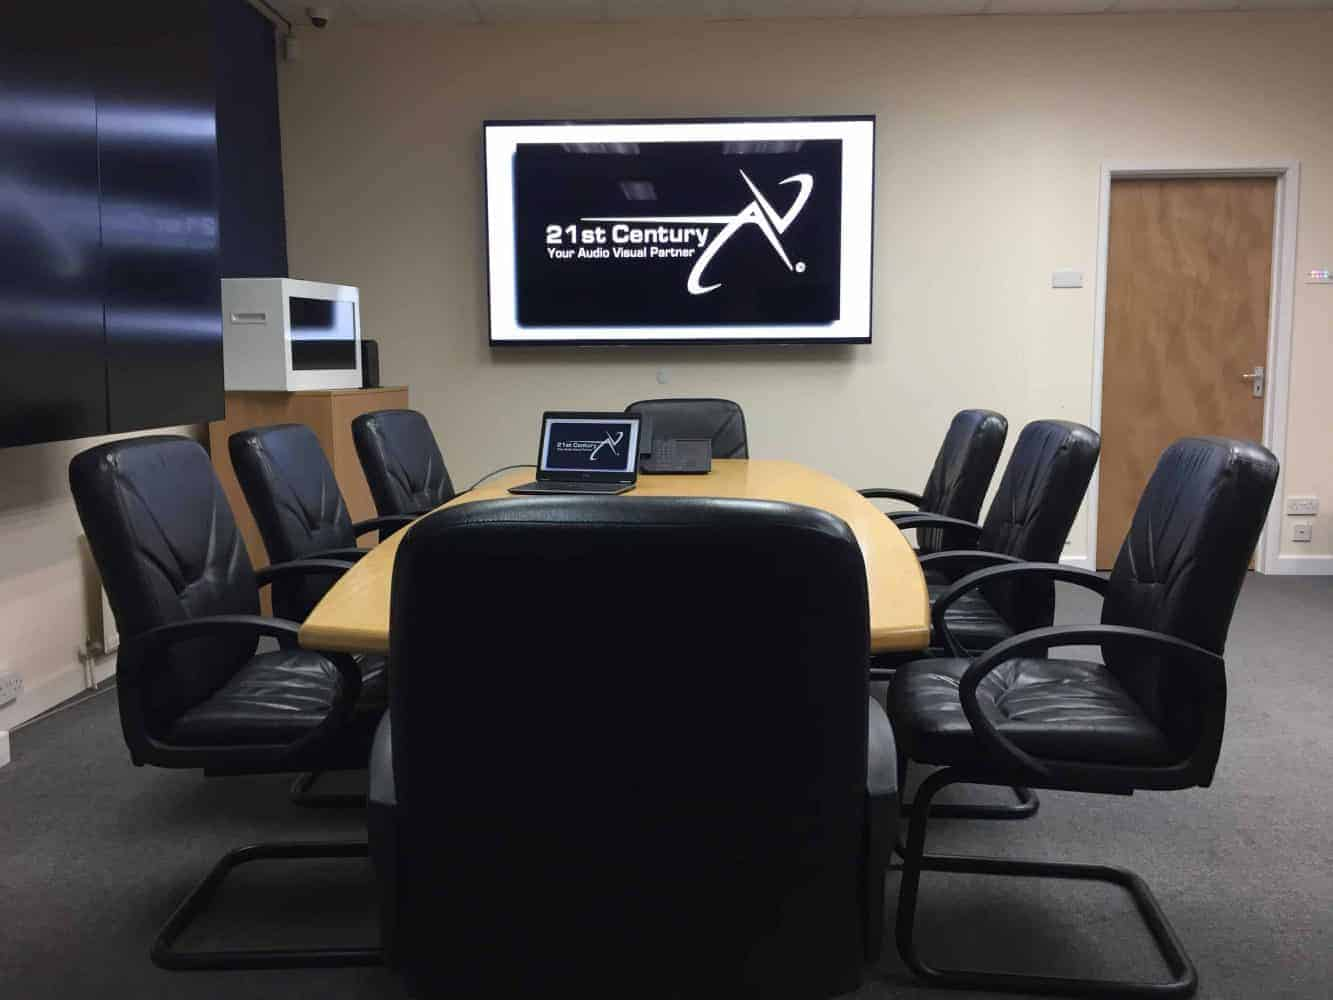 21st Century Offices